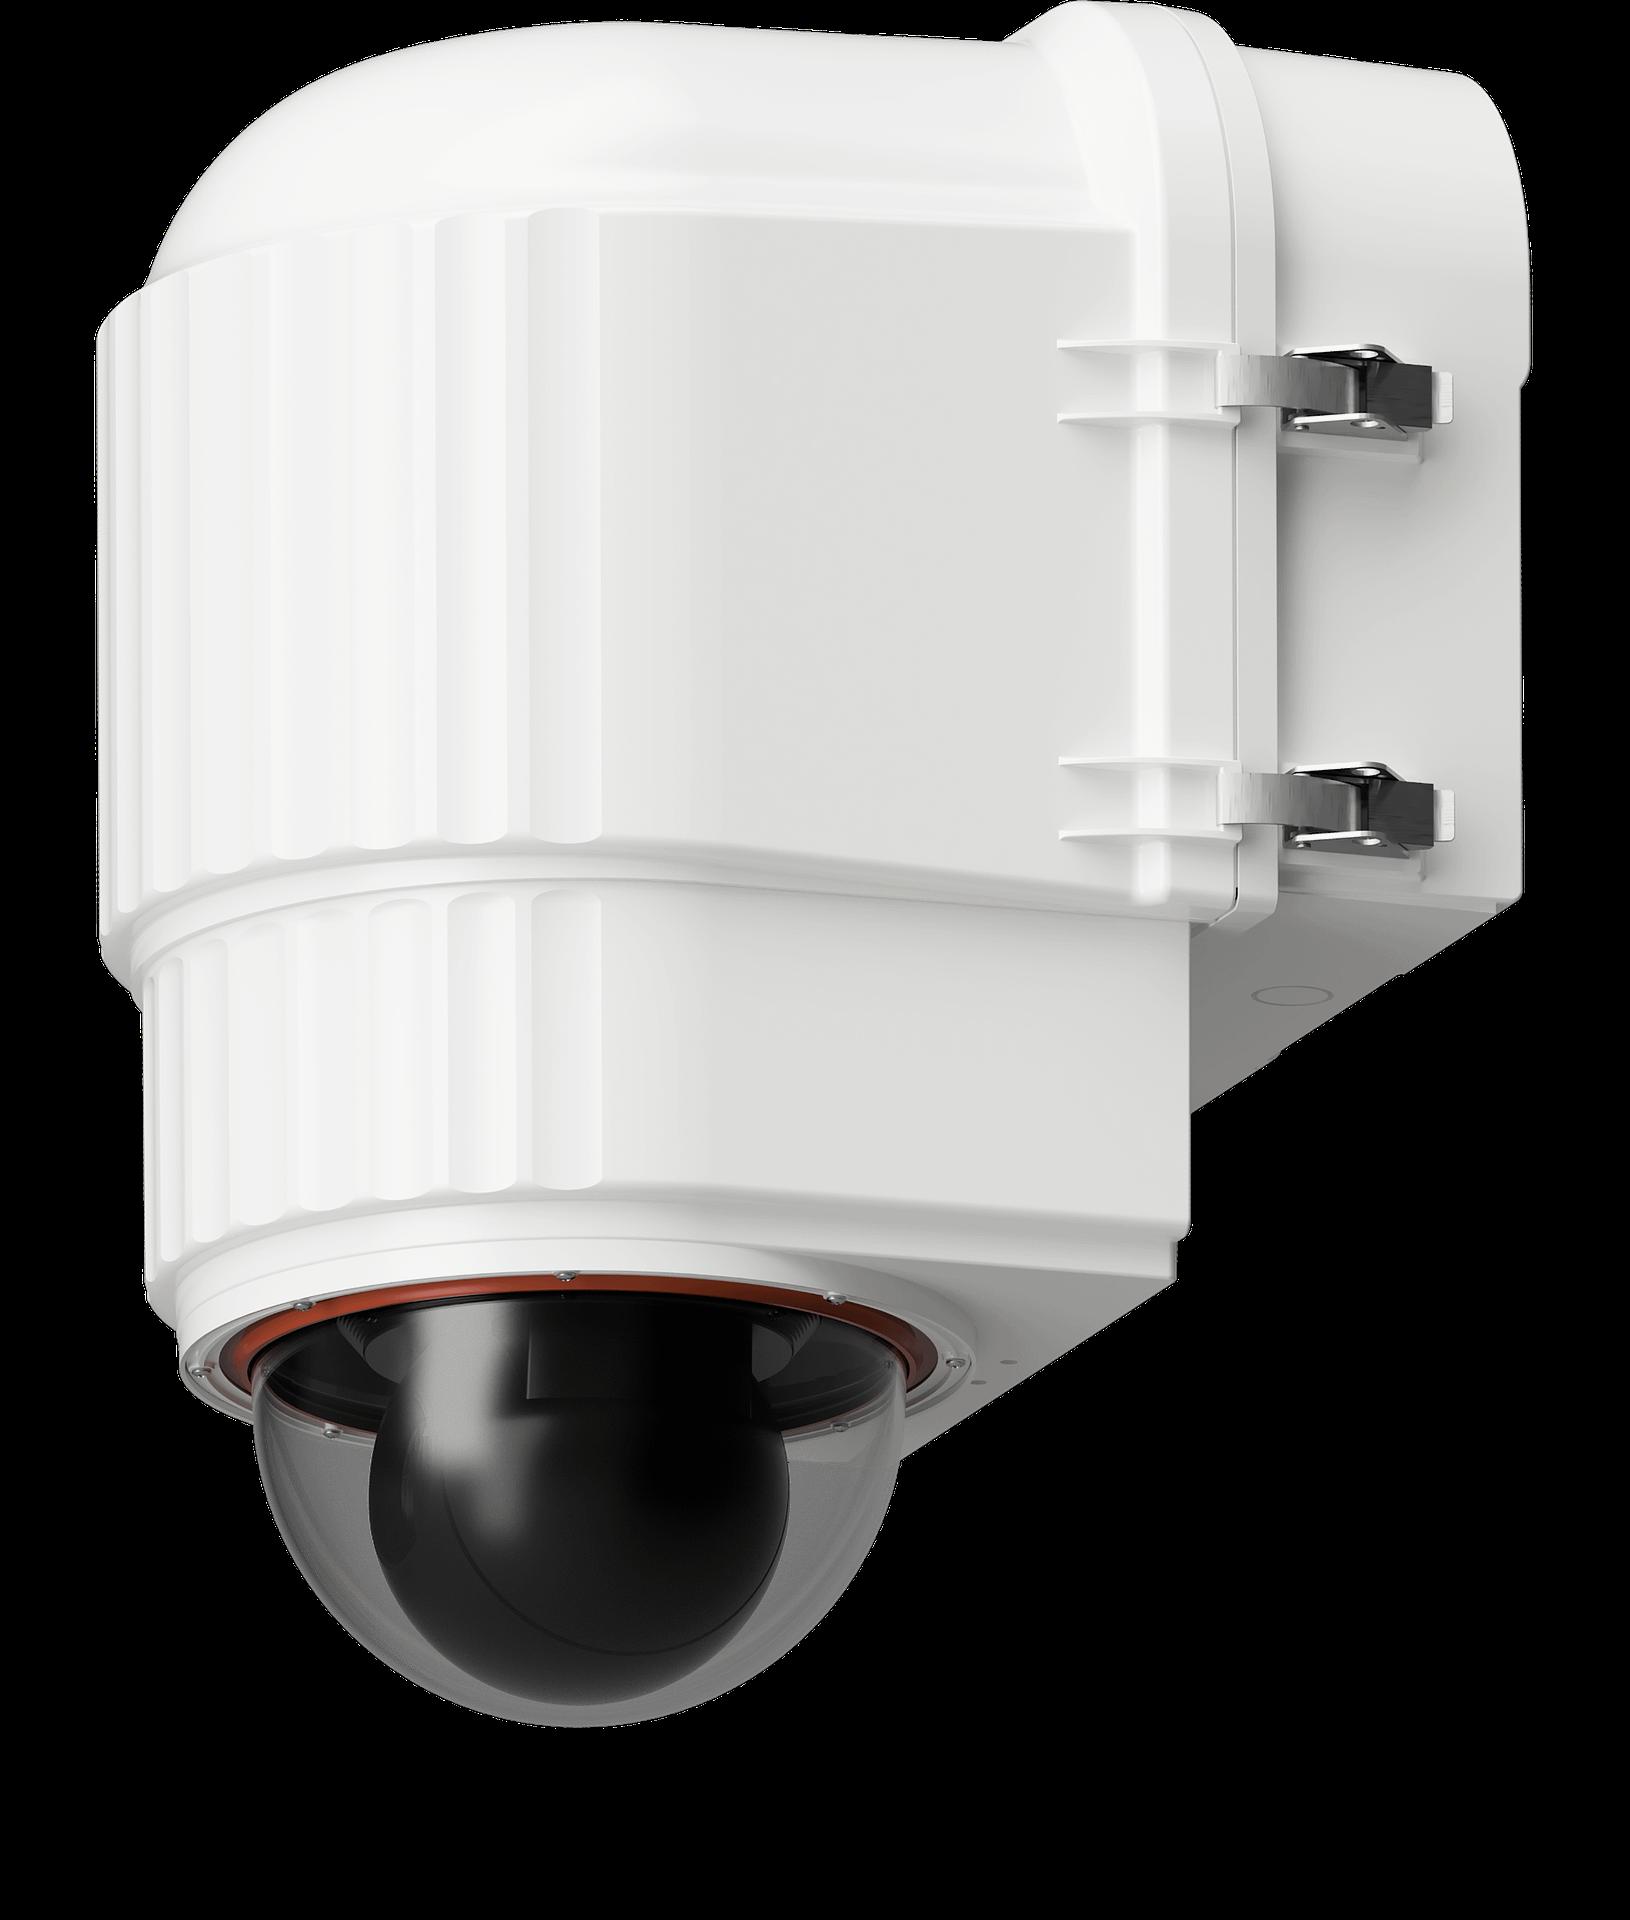 x stream designs xheat ev climate controlled ptz camera enclosure se sized